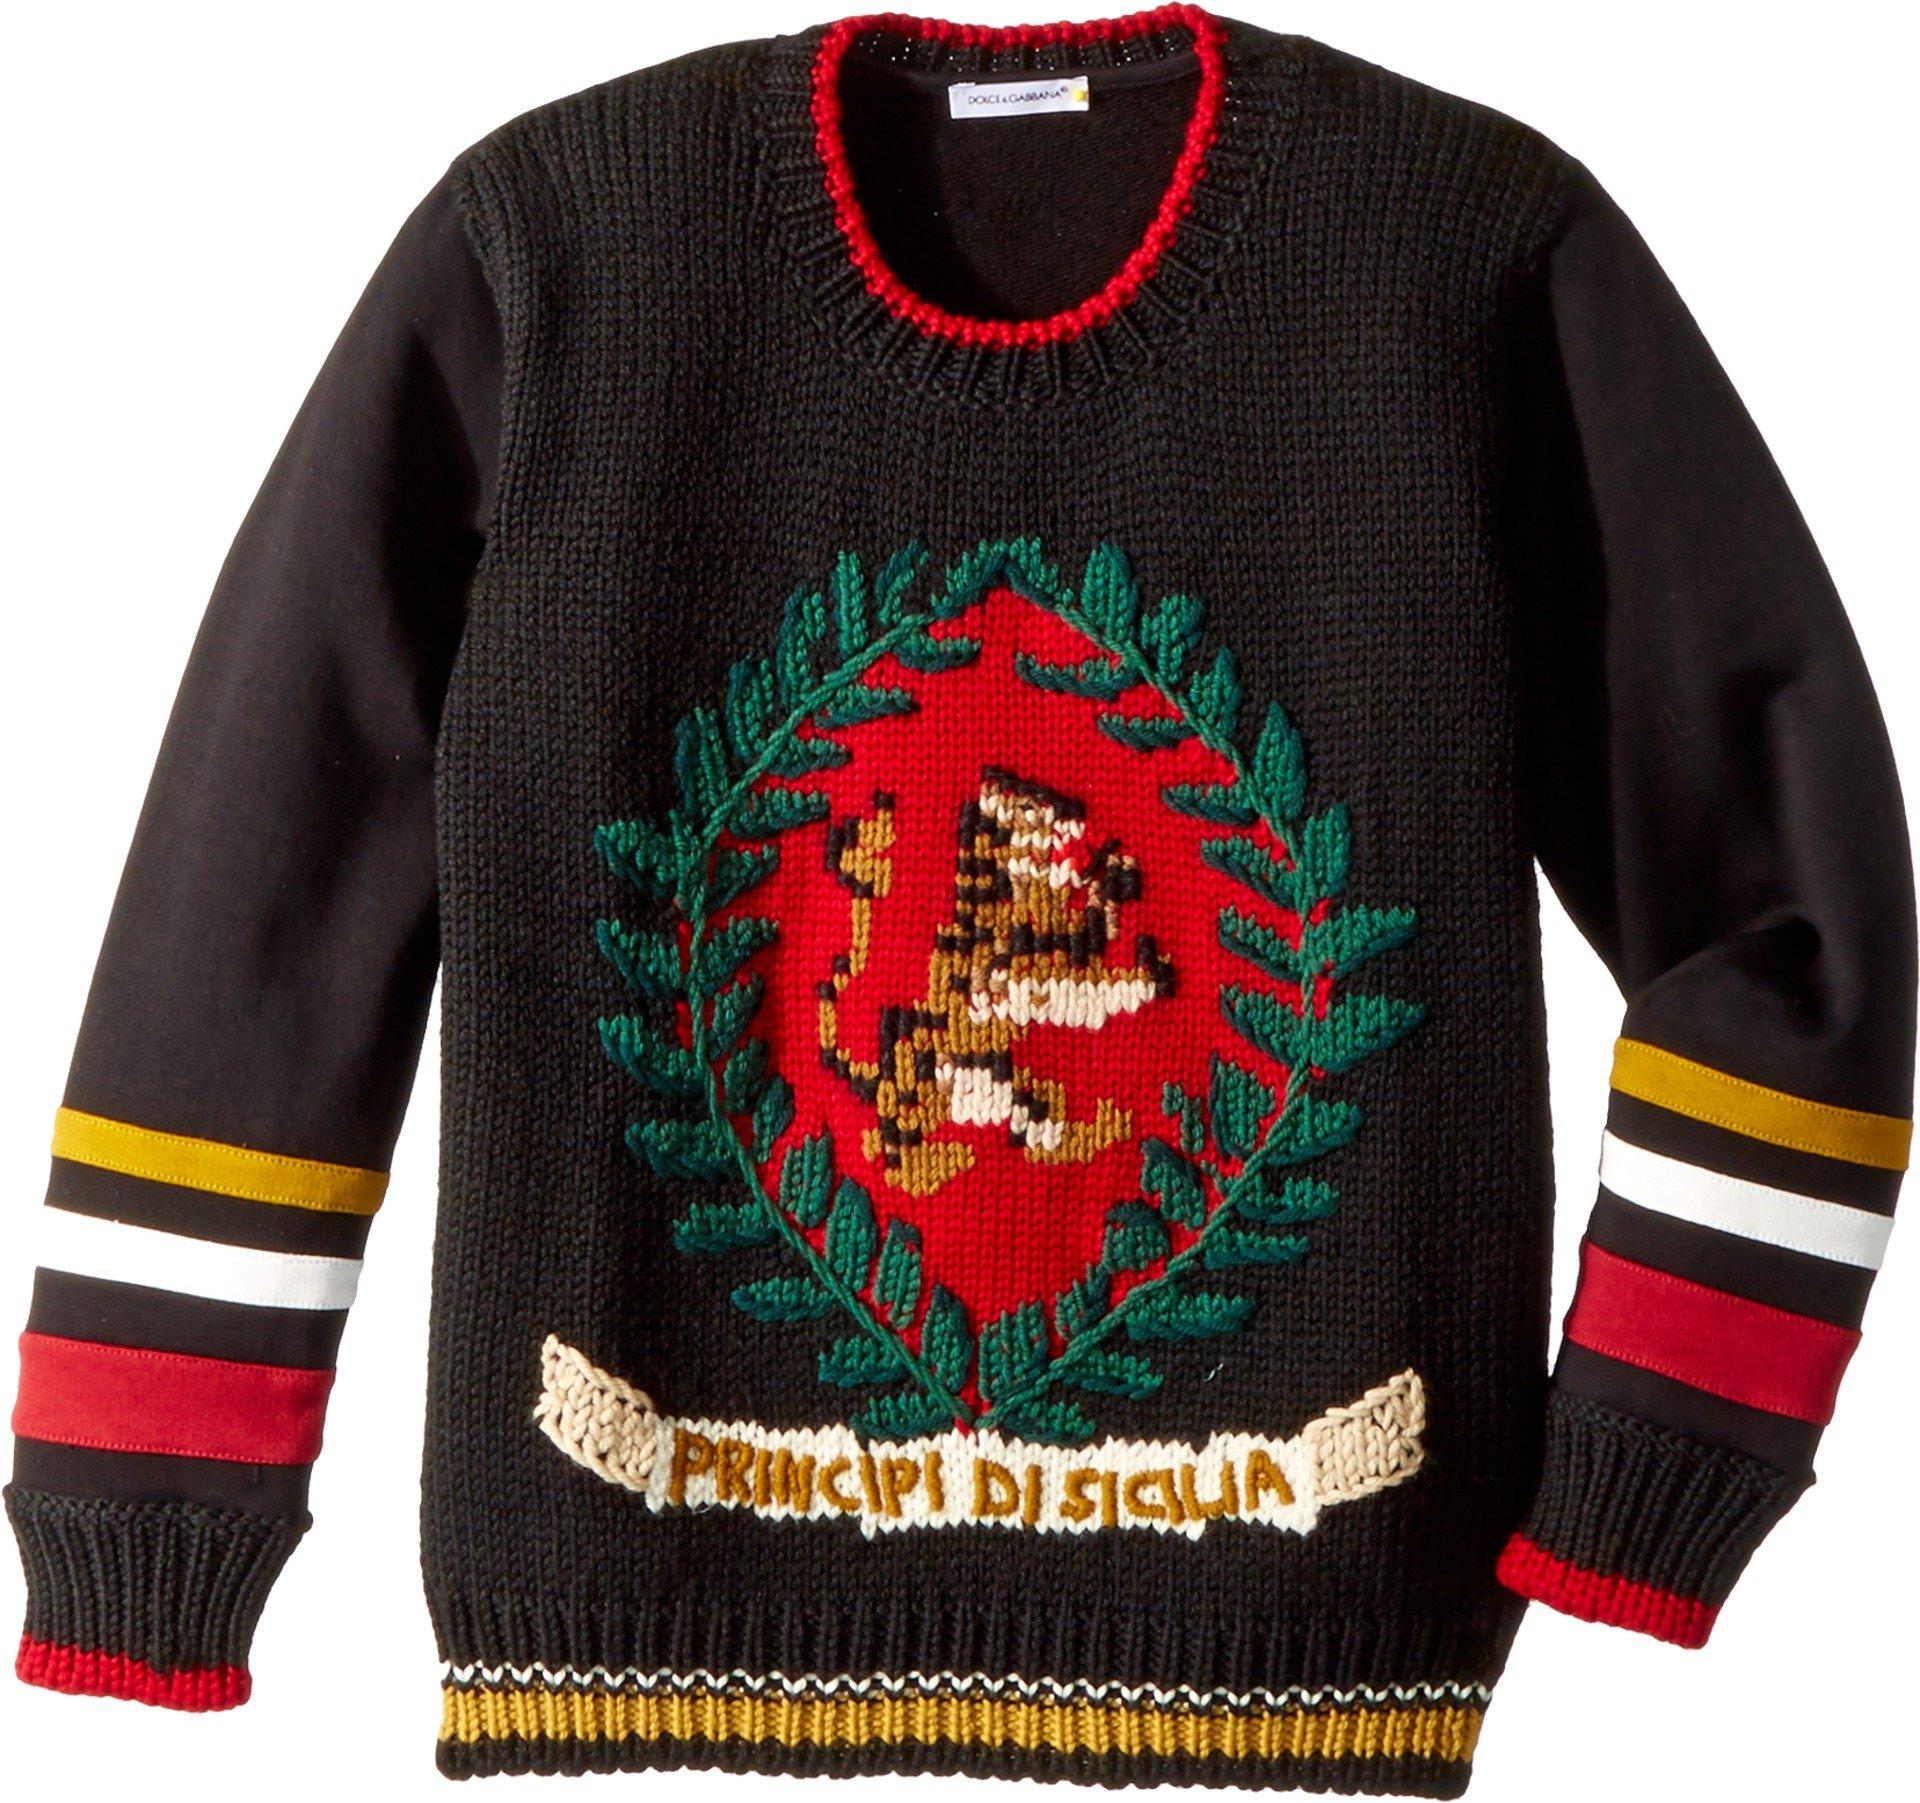 Dolce & Gabbana Kids Baby Boy's Sicily Sweatshirt (Toddler/Little Kids) Black Print 2T Toddler by Dolce & Gabbana